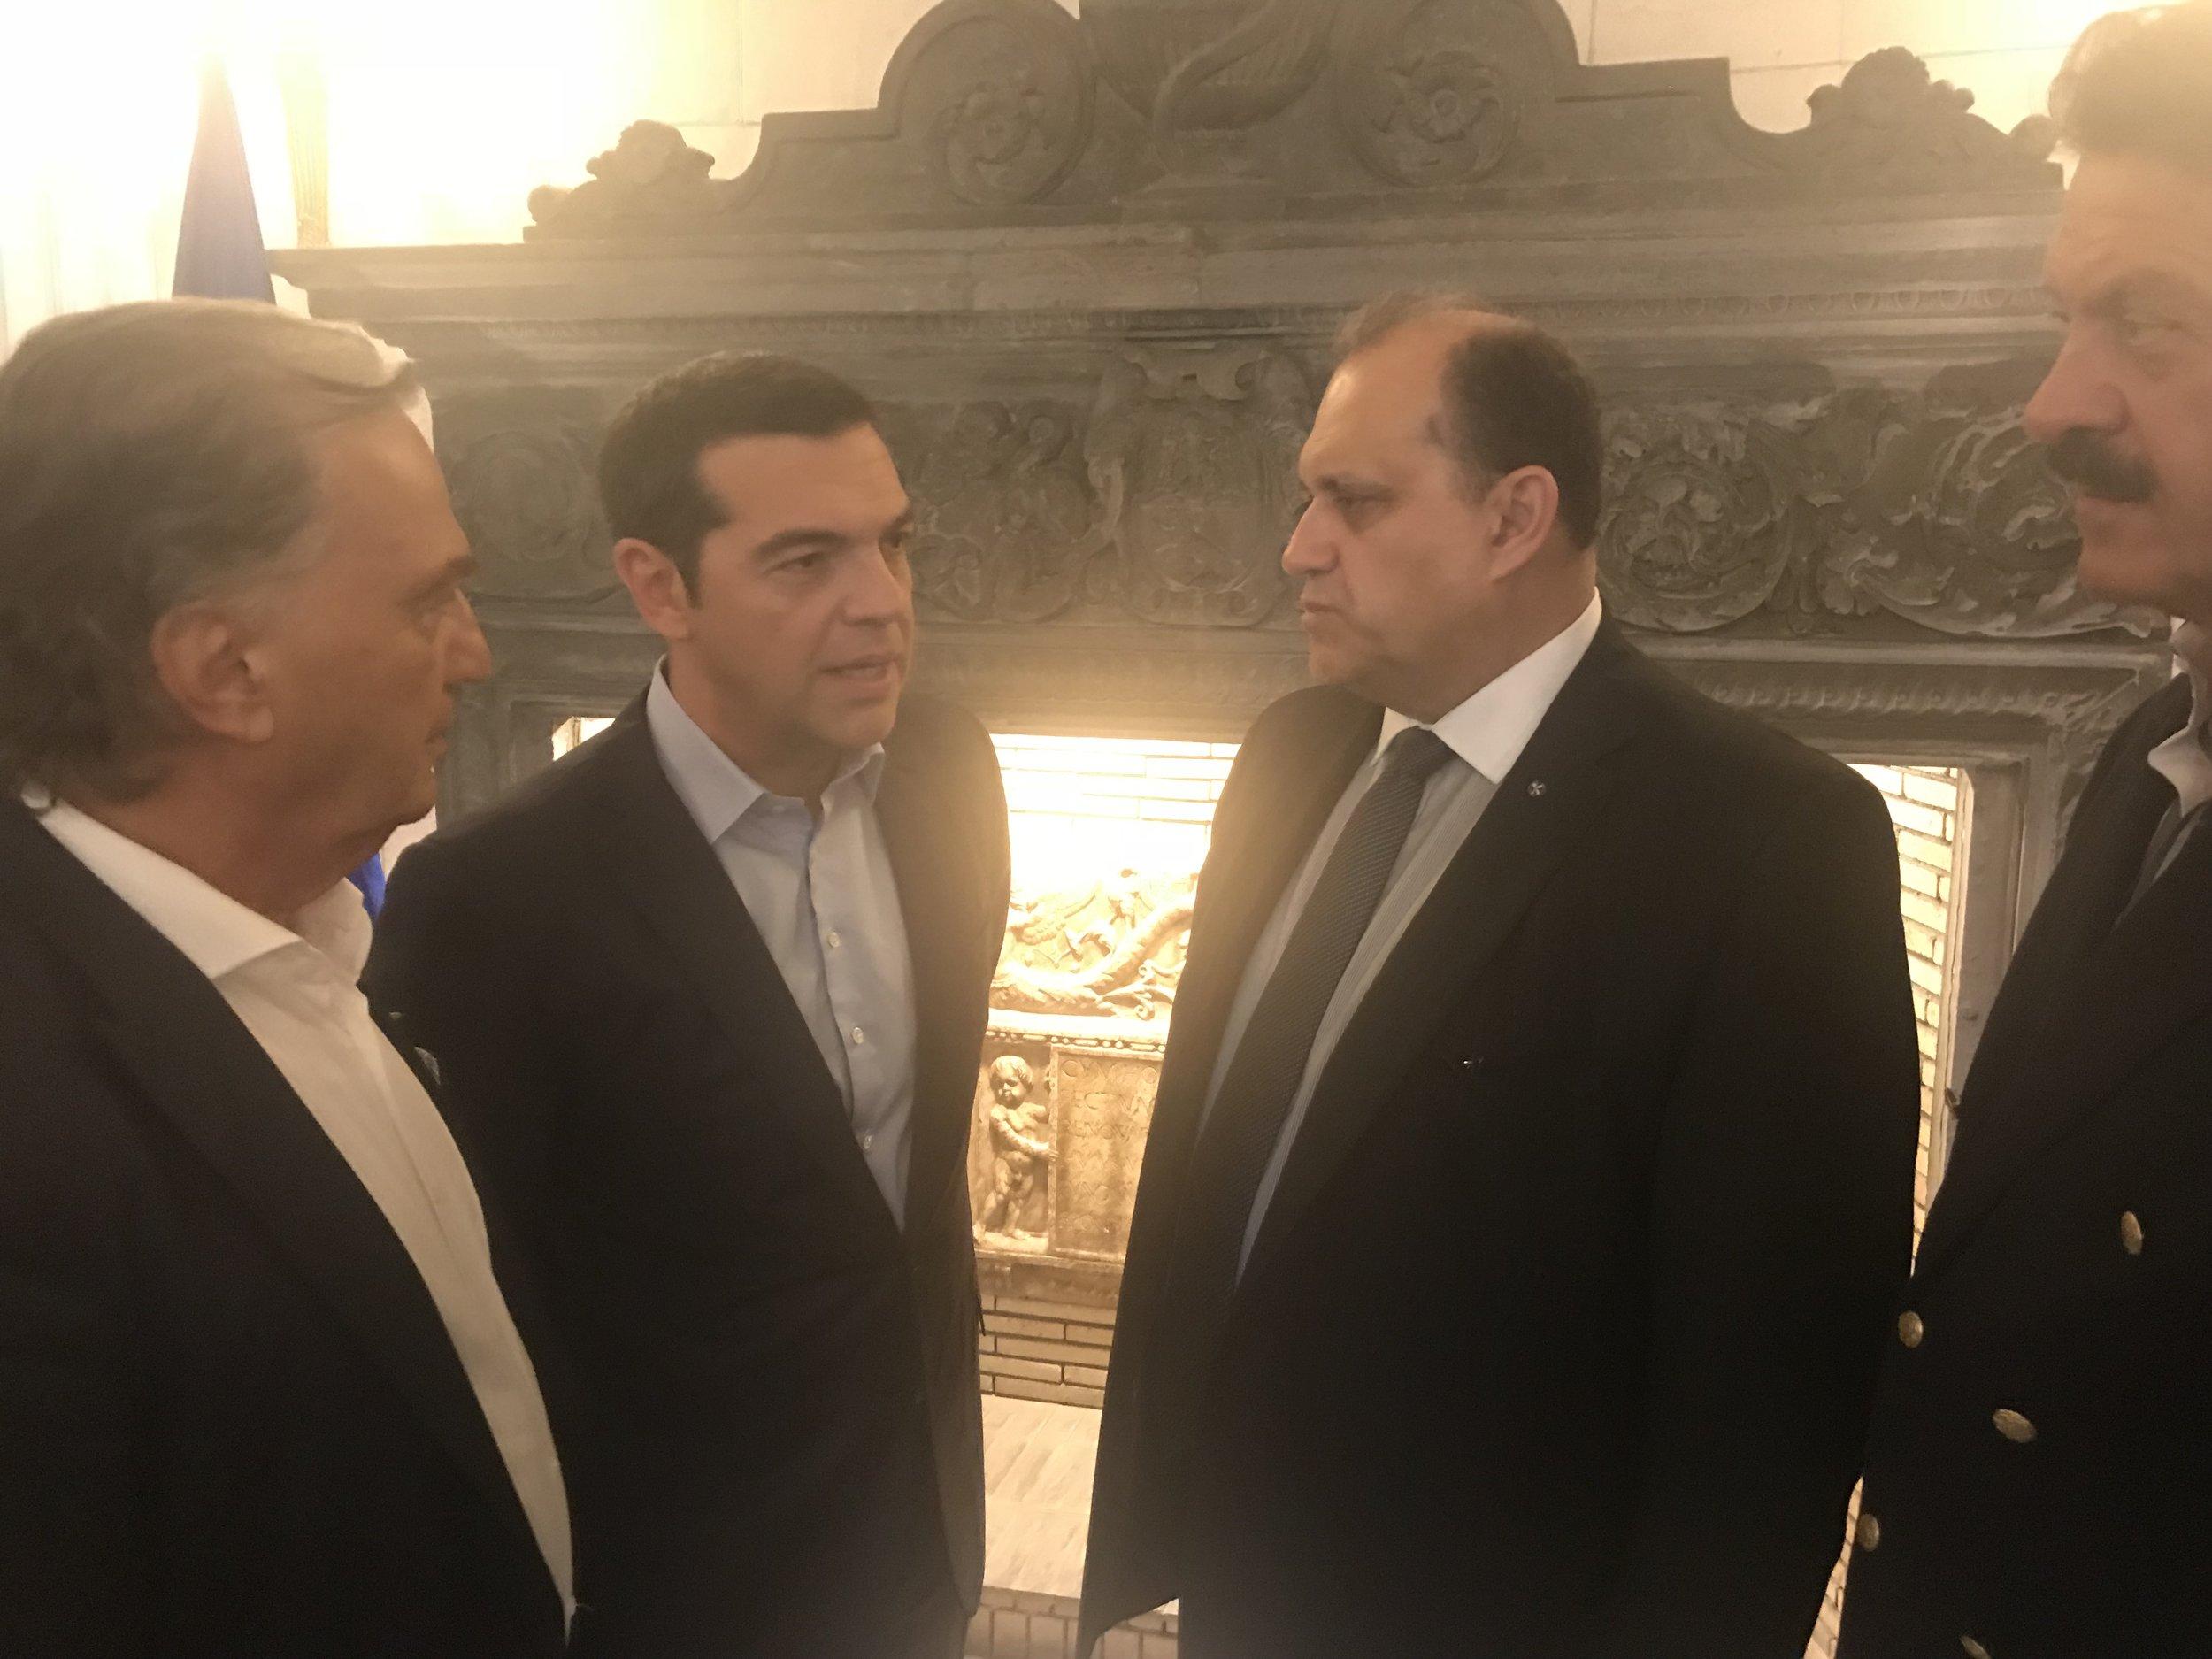 Nick Larigakis speaks with Prime Minister Tsipras.